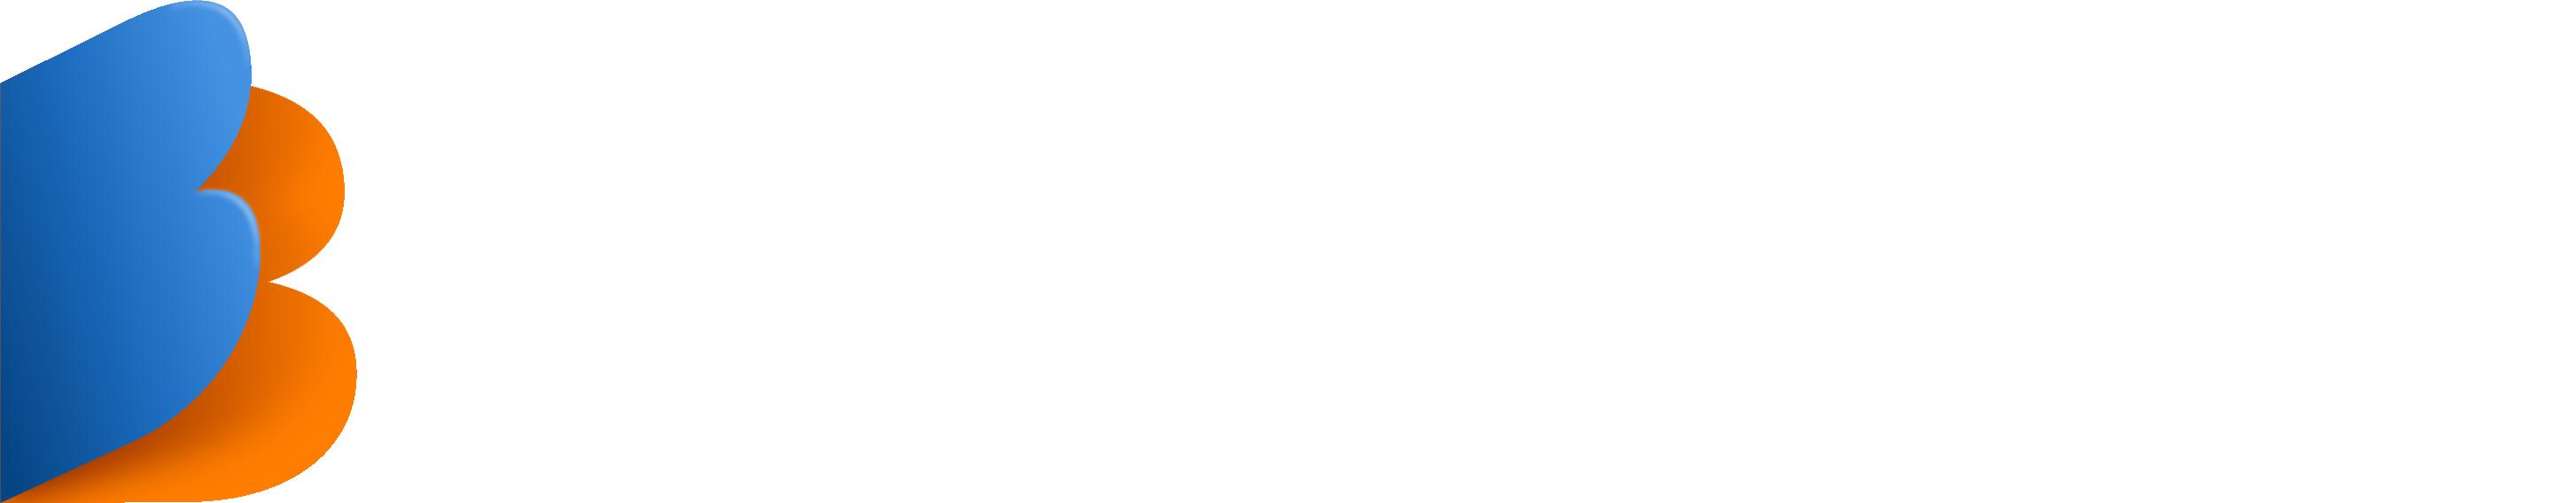 Bibliography.com